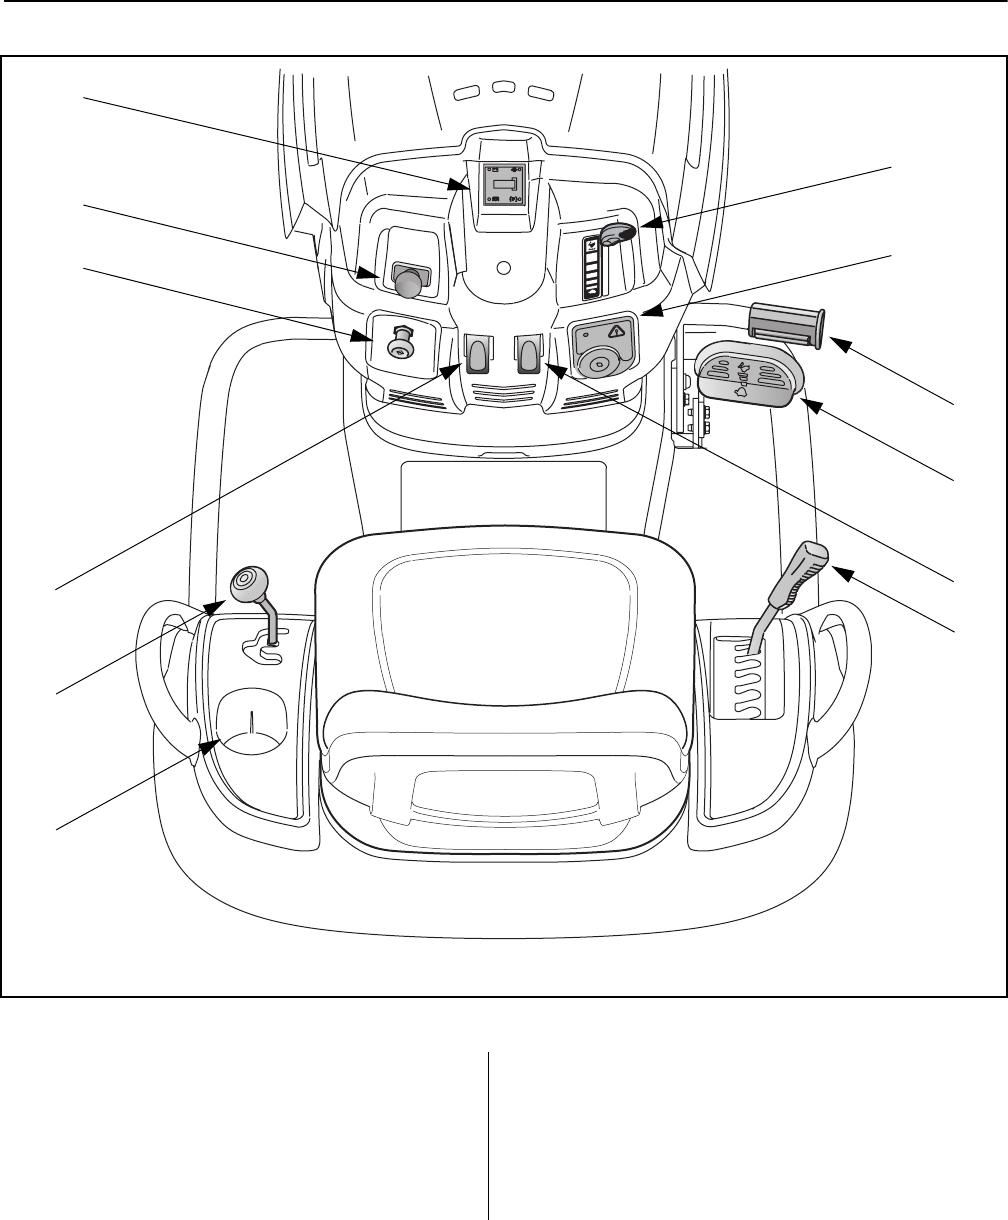 Toro Lx500 Users Manual 769 02256A